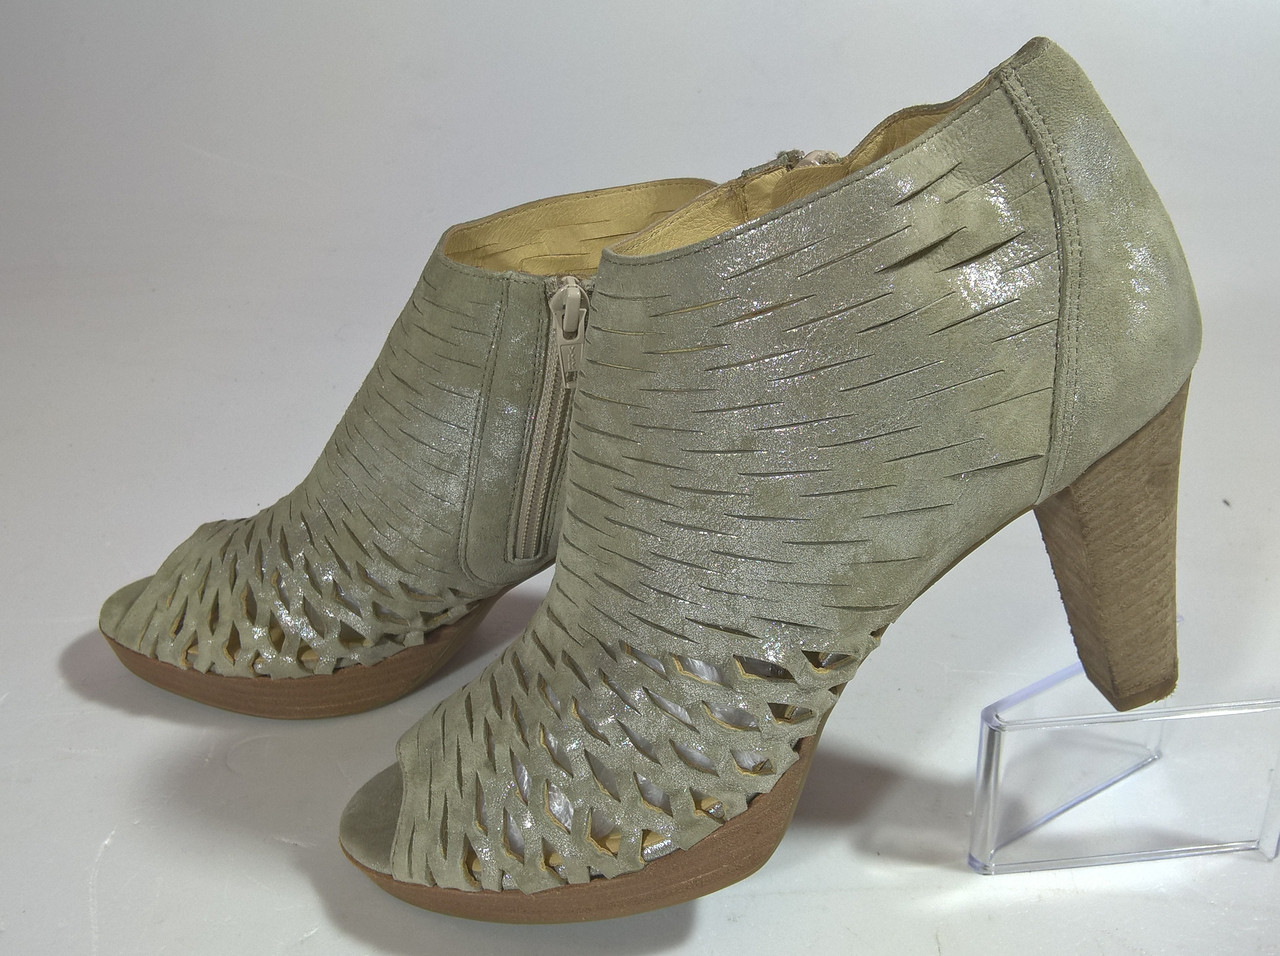 Босоножки женские 40 размер бренд PAUL GREEN (Austriy)